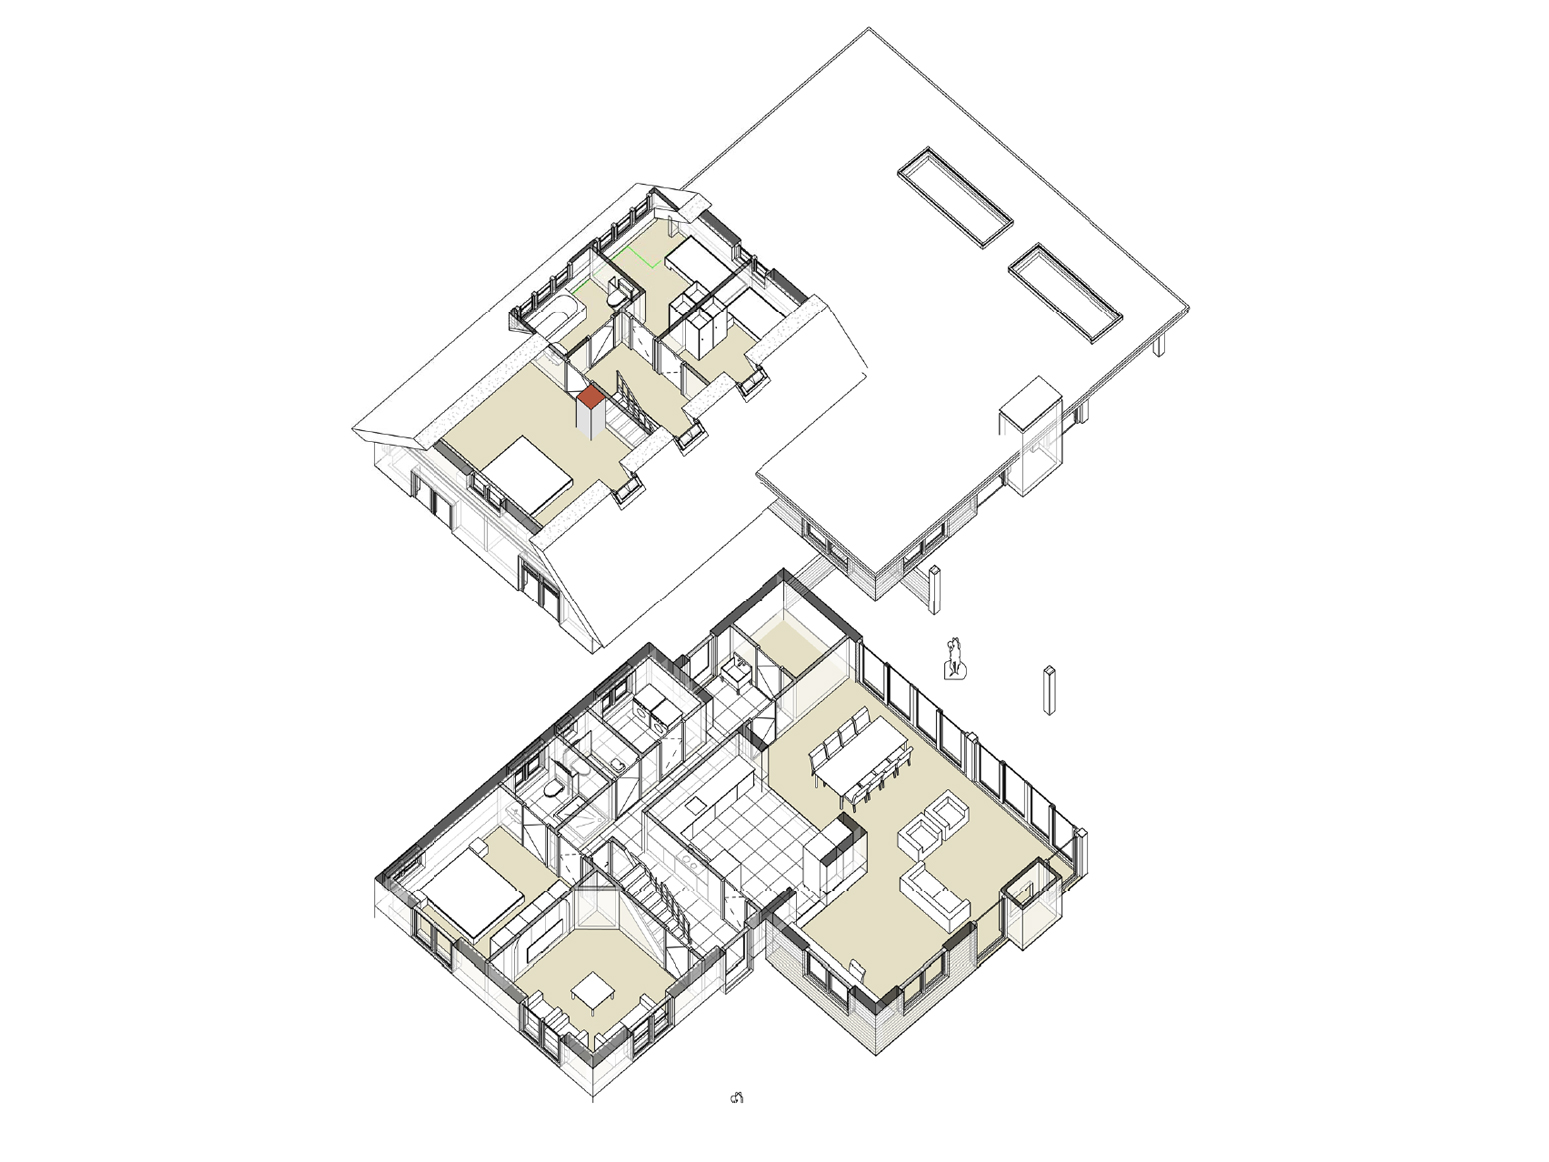 boerderij-verbouwing-uitbouw-beemte-broekland-van-oord-architectuur-en-design-wenum-wiesel-architect-voorst-architect-apeldoorn-3